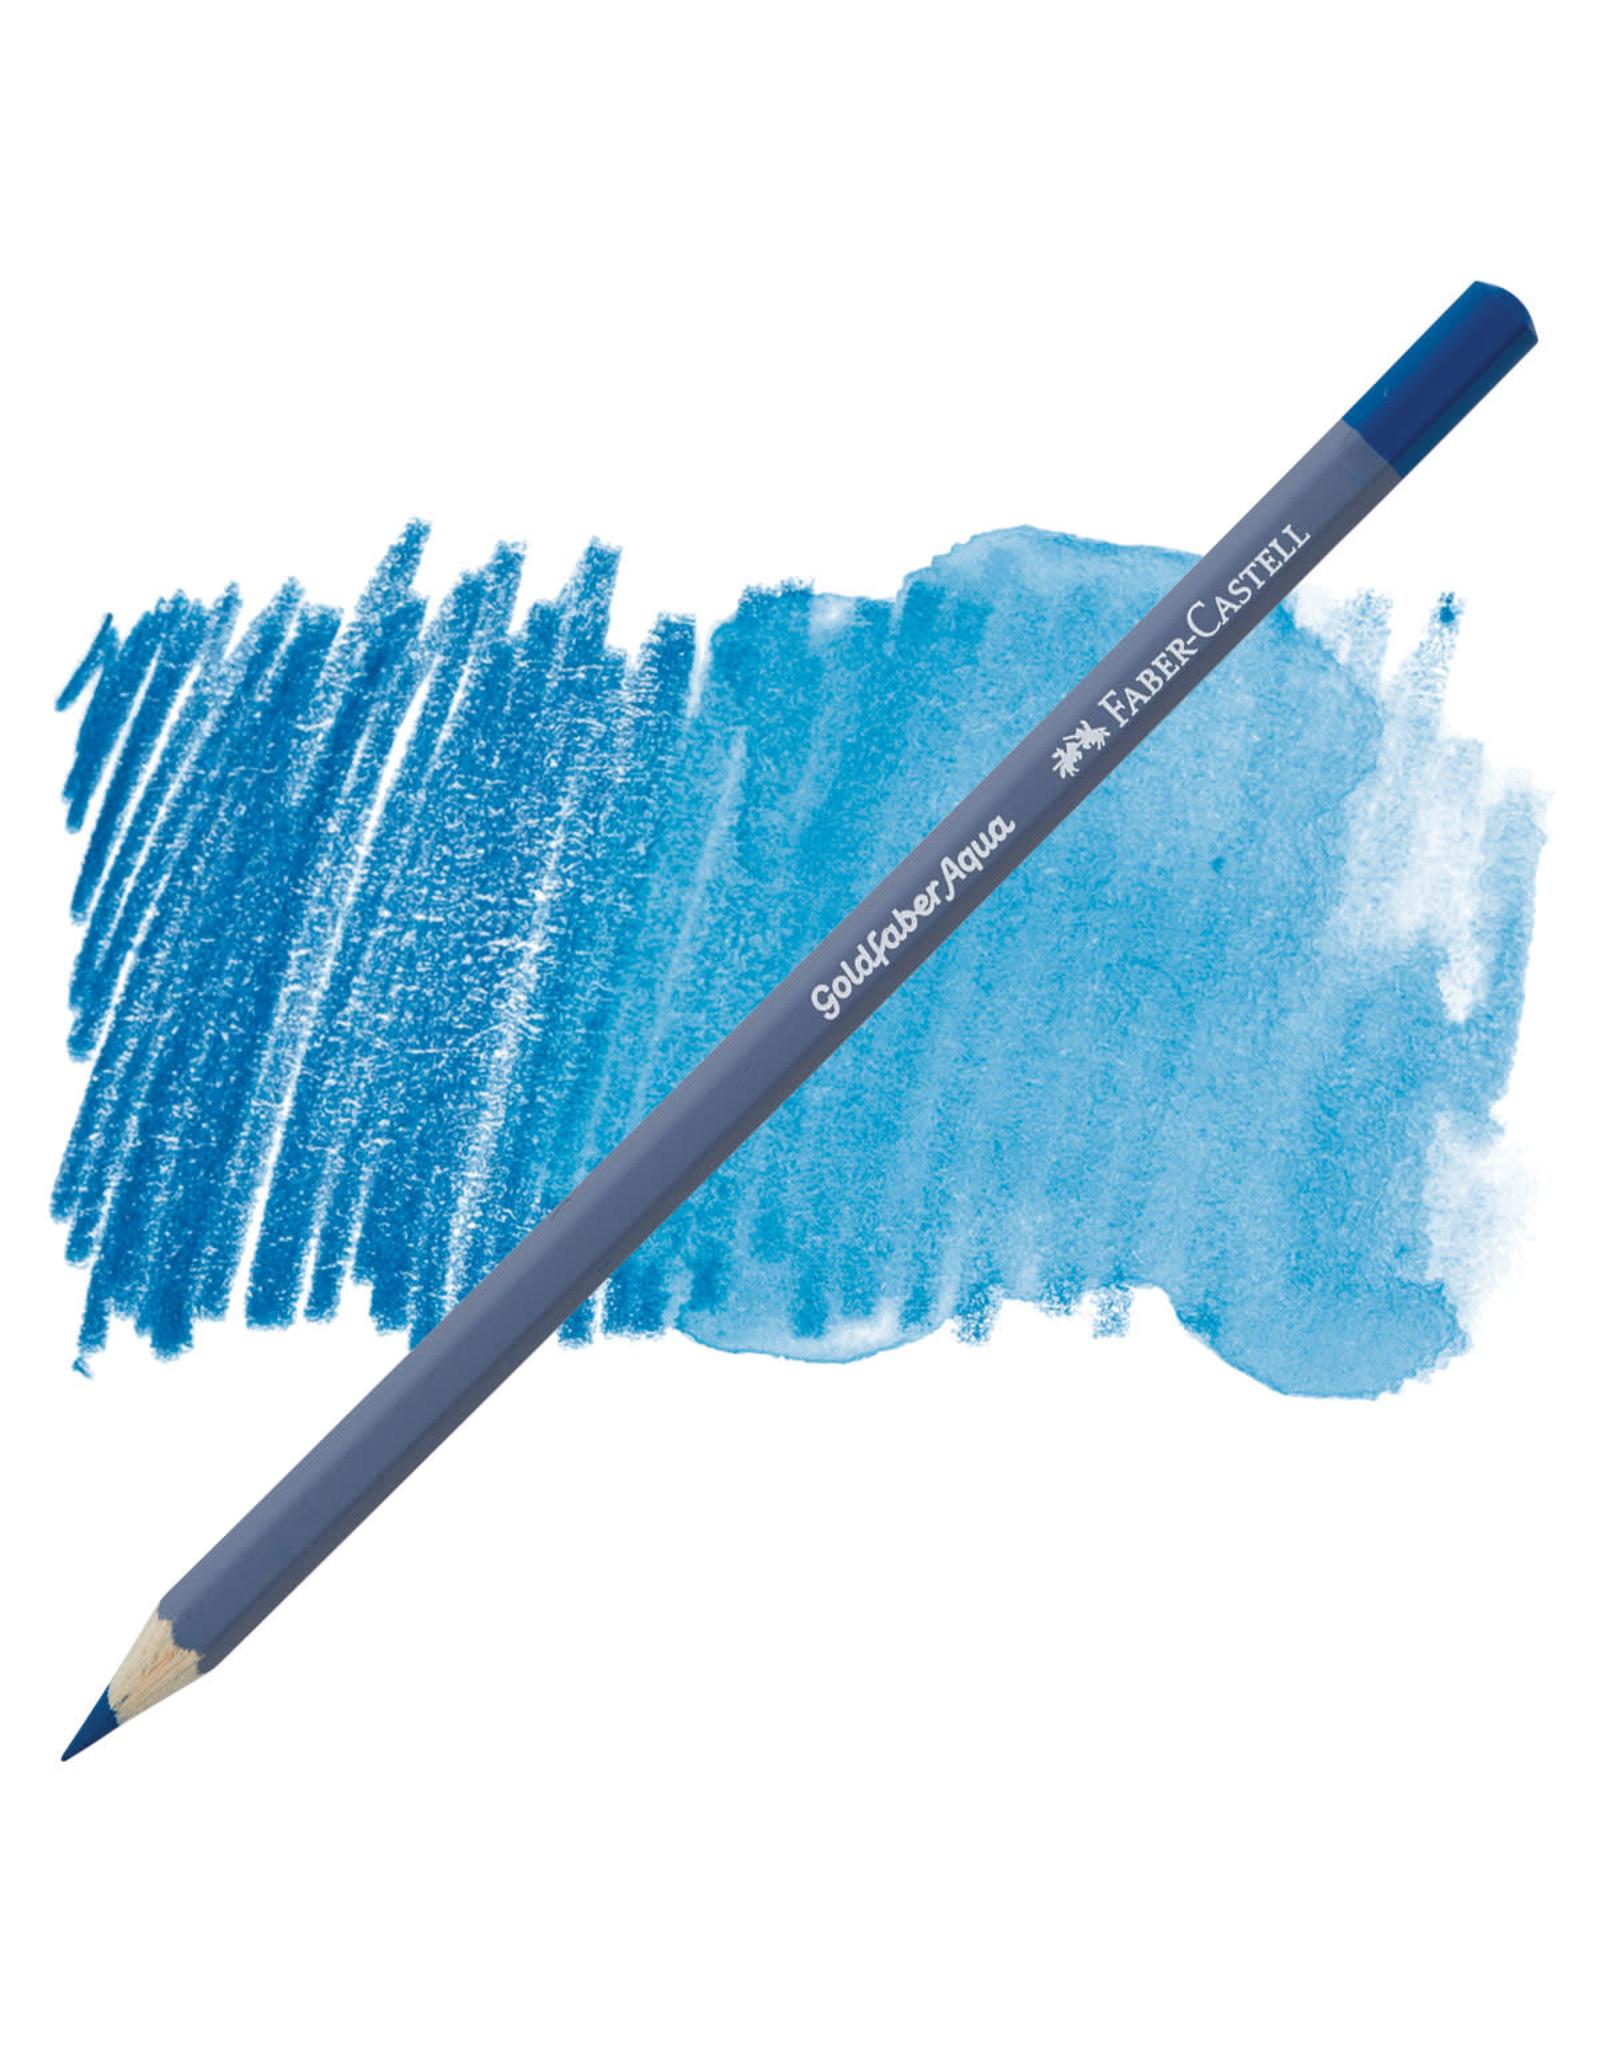 Faber-Castell Goldfaber Aqua Watercolor Pencil - Bluish Turquoise #149